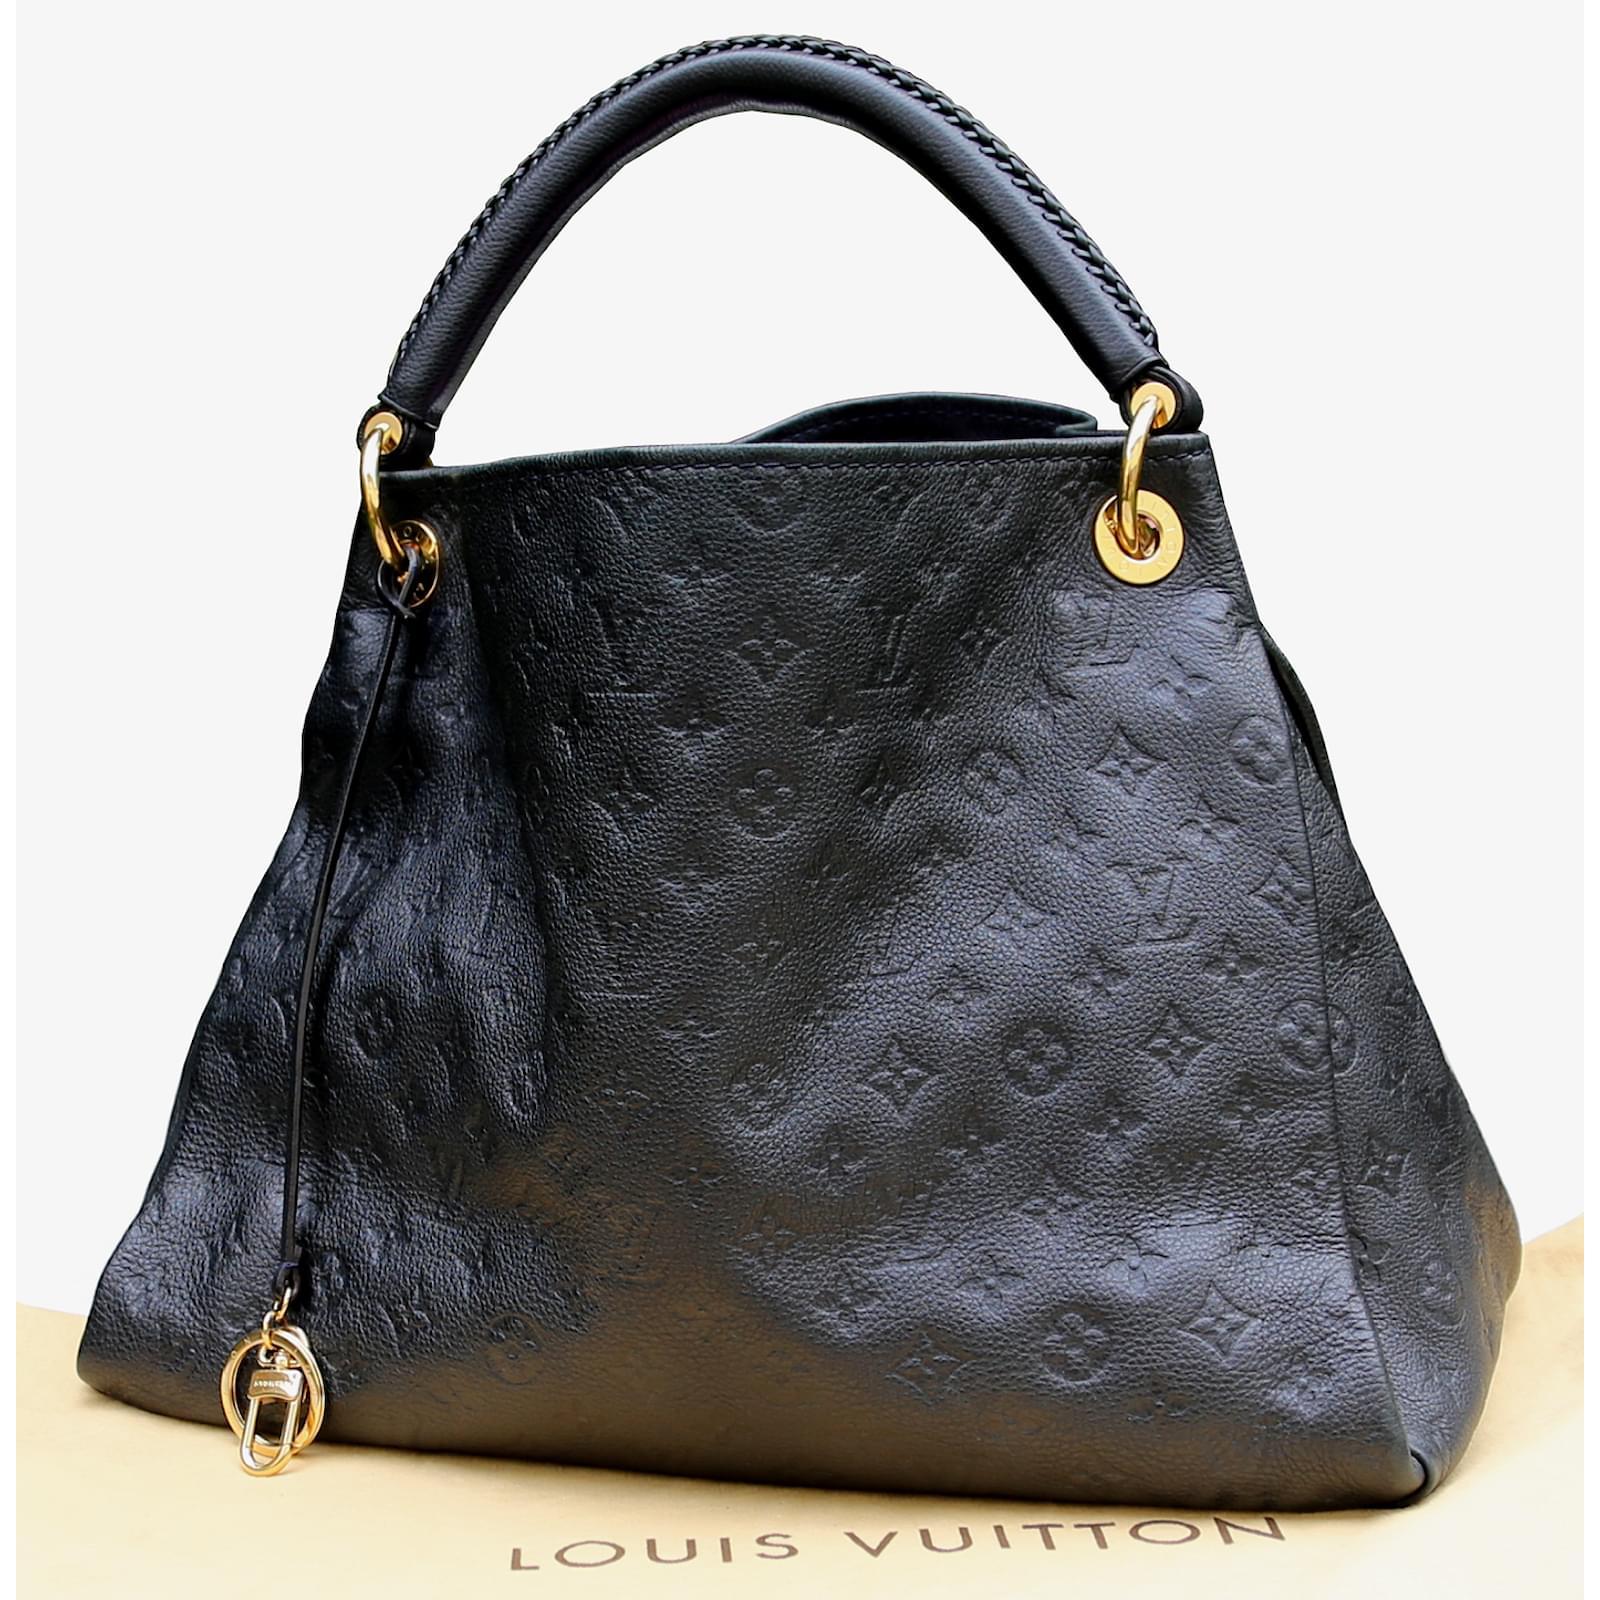 eb3f25c5a8 Louis Vuitton Handbags Handbags Leather Blue ref.6147 - Joli Closet